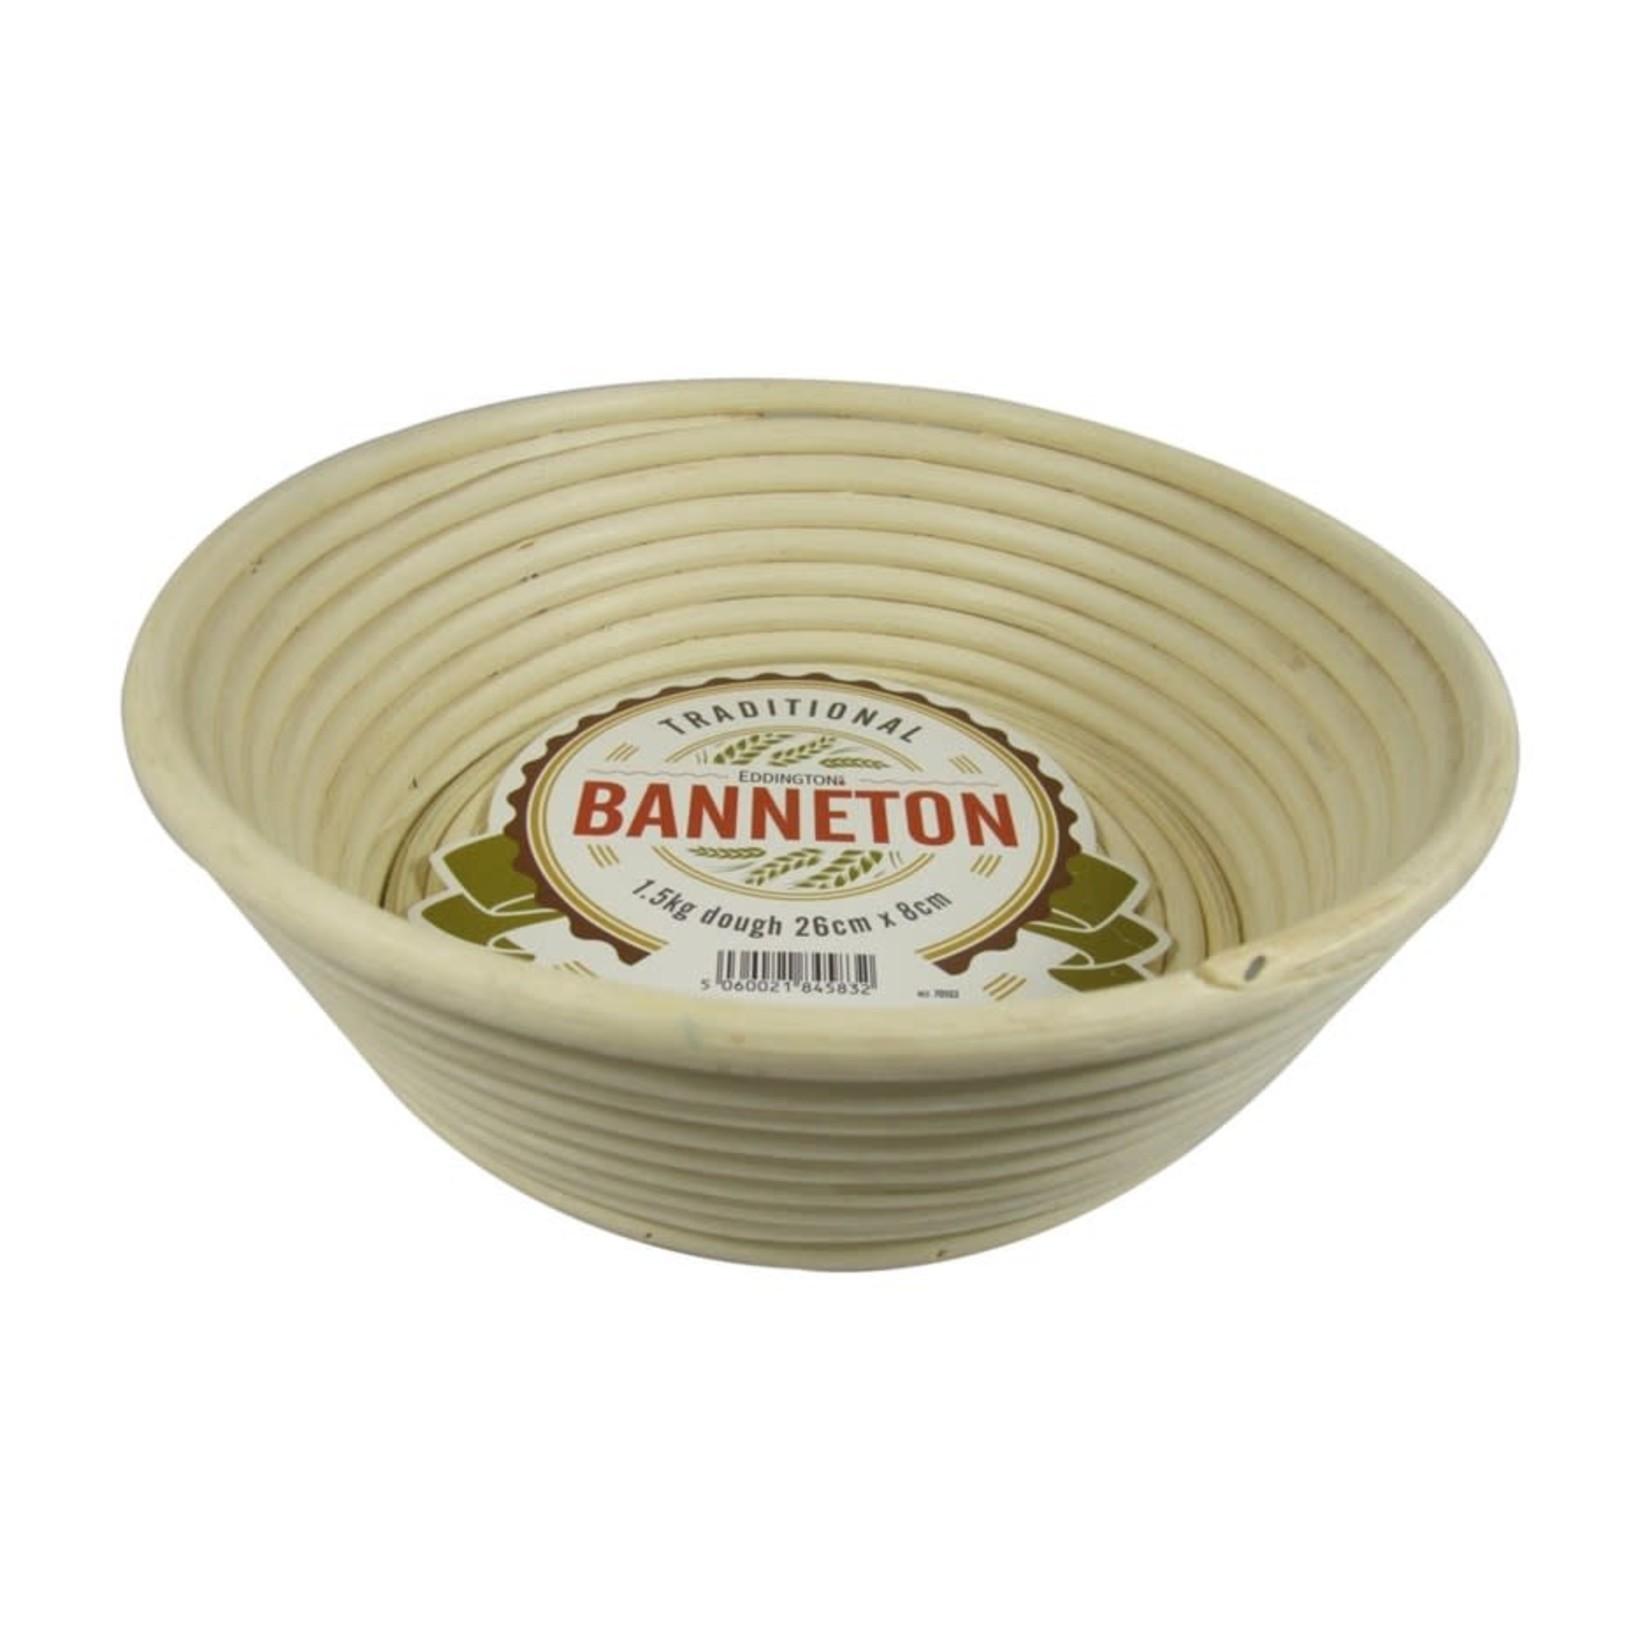 Banneton Bakets